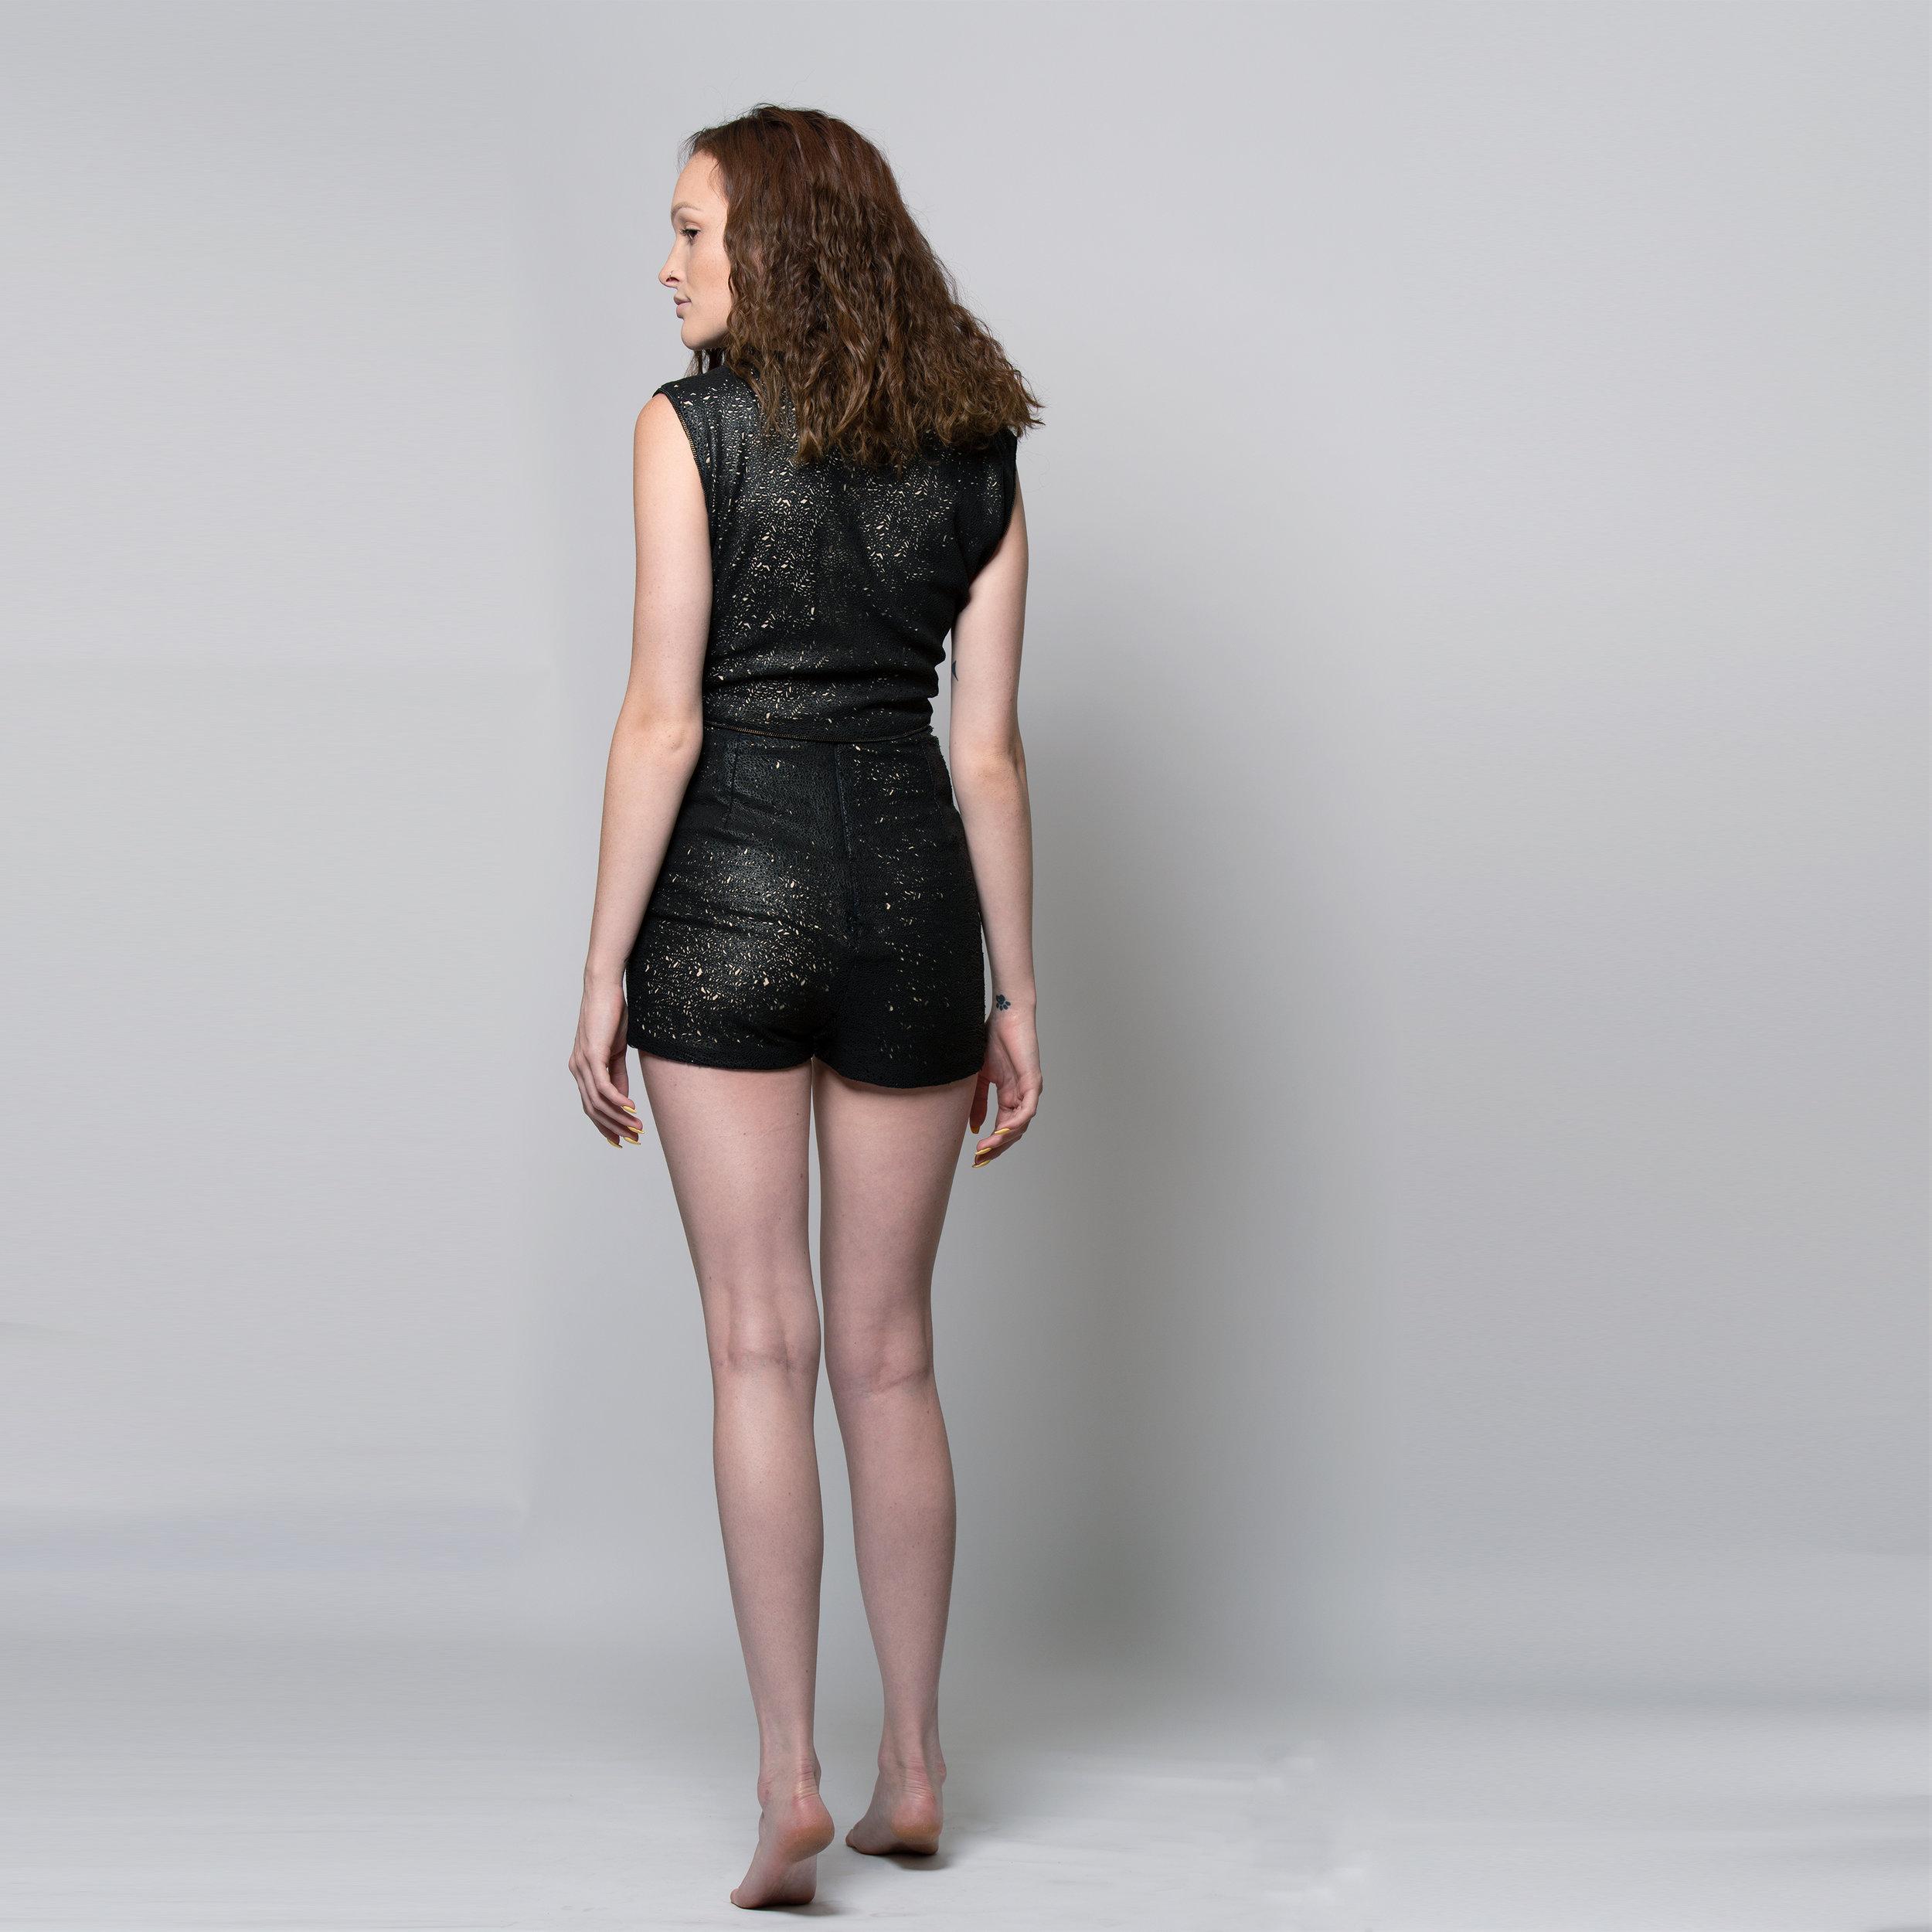 Nadjarina - Laser Cut Leather High Waist Short